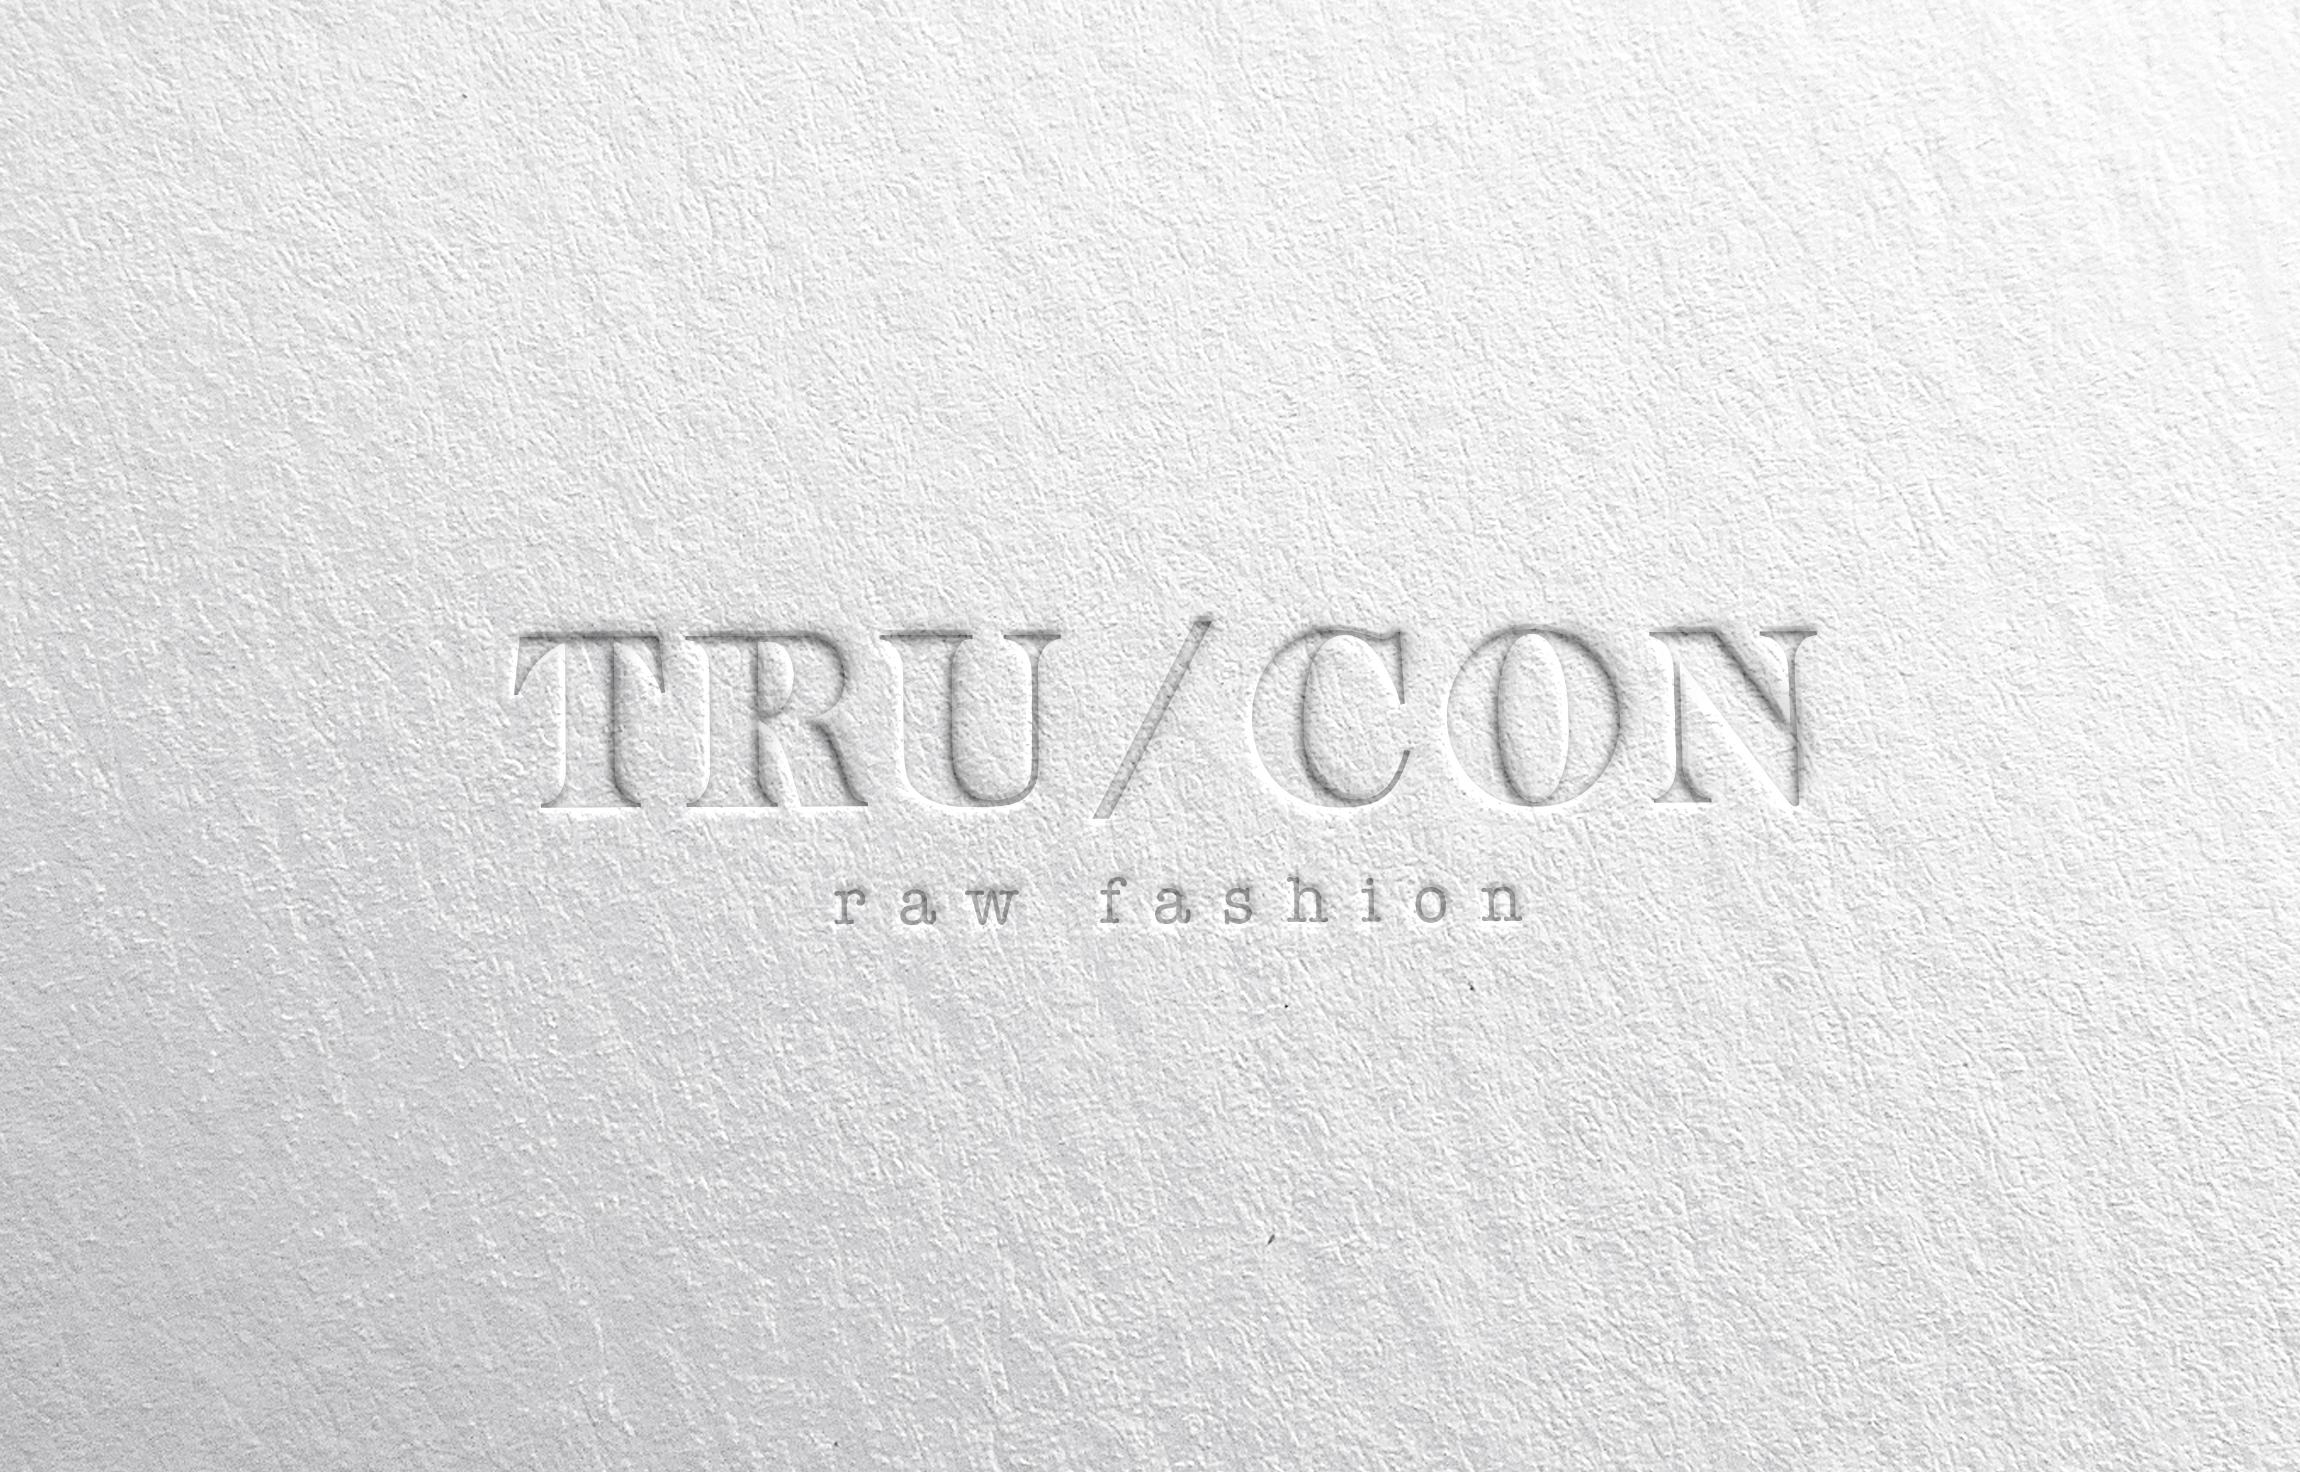 Lisa Hartmann Trucon Brand Design HMKW Köln